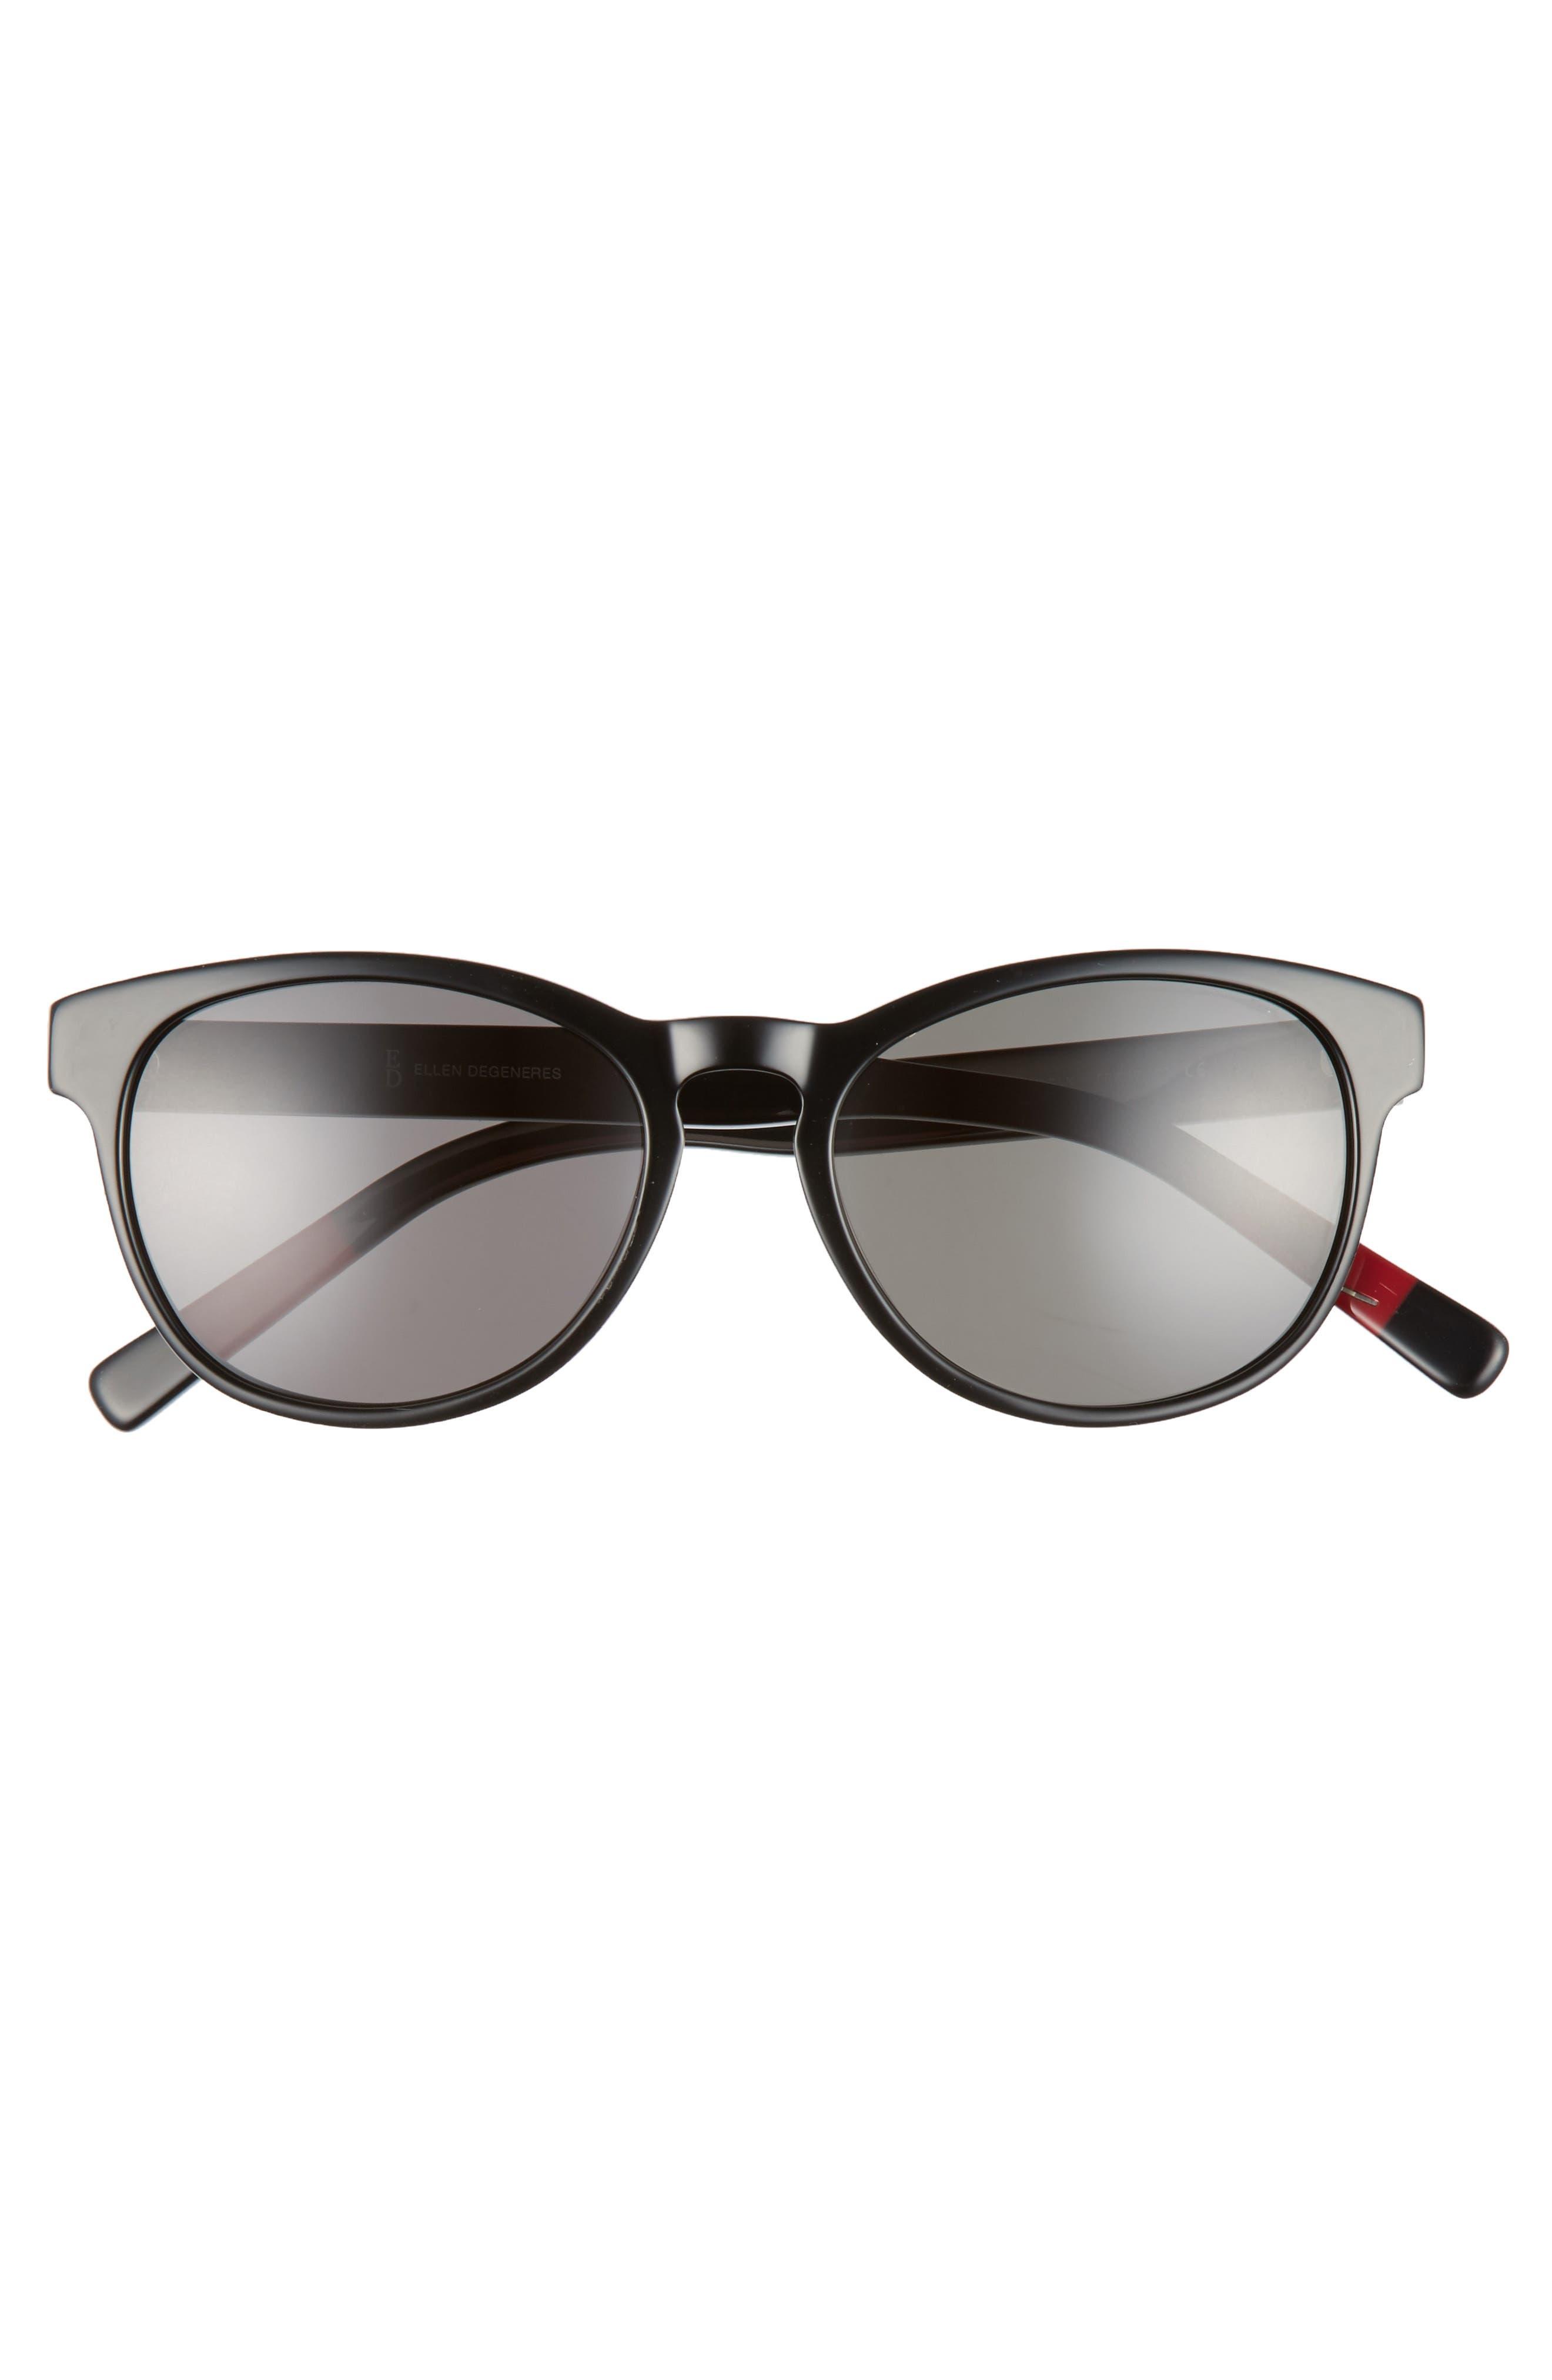 50mm Gradient Sunglasses,                             Alternate thumbnail 3, color,                             001